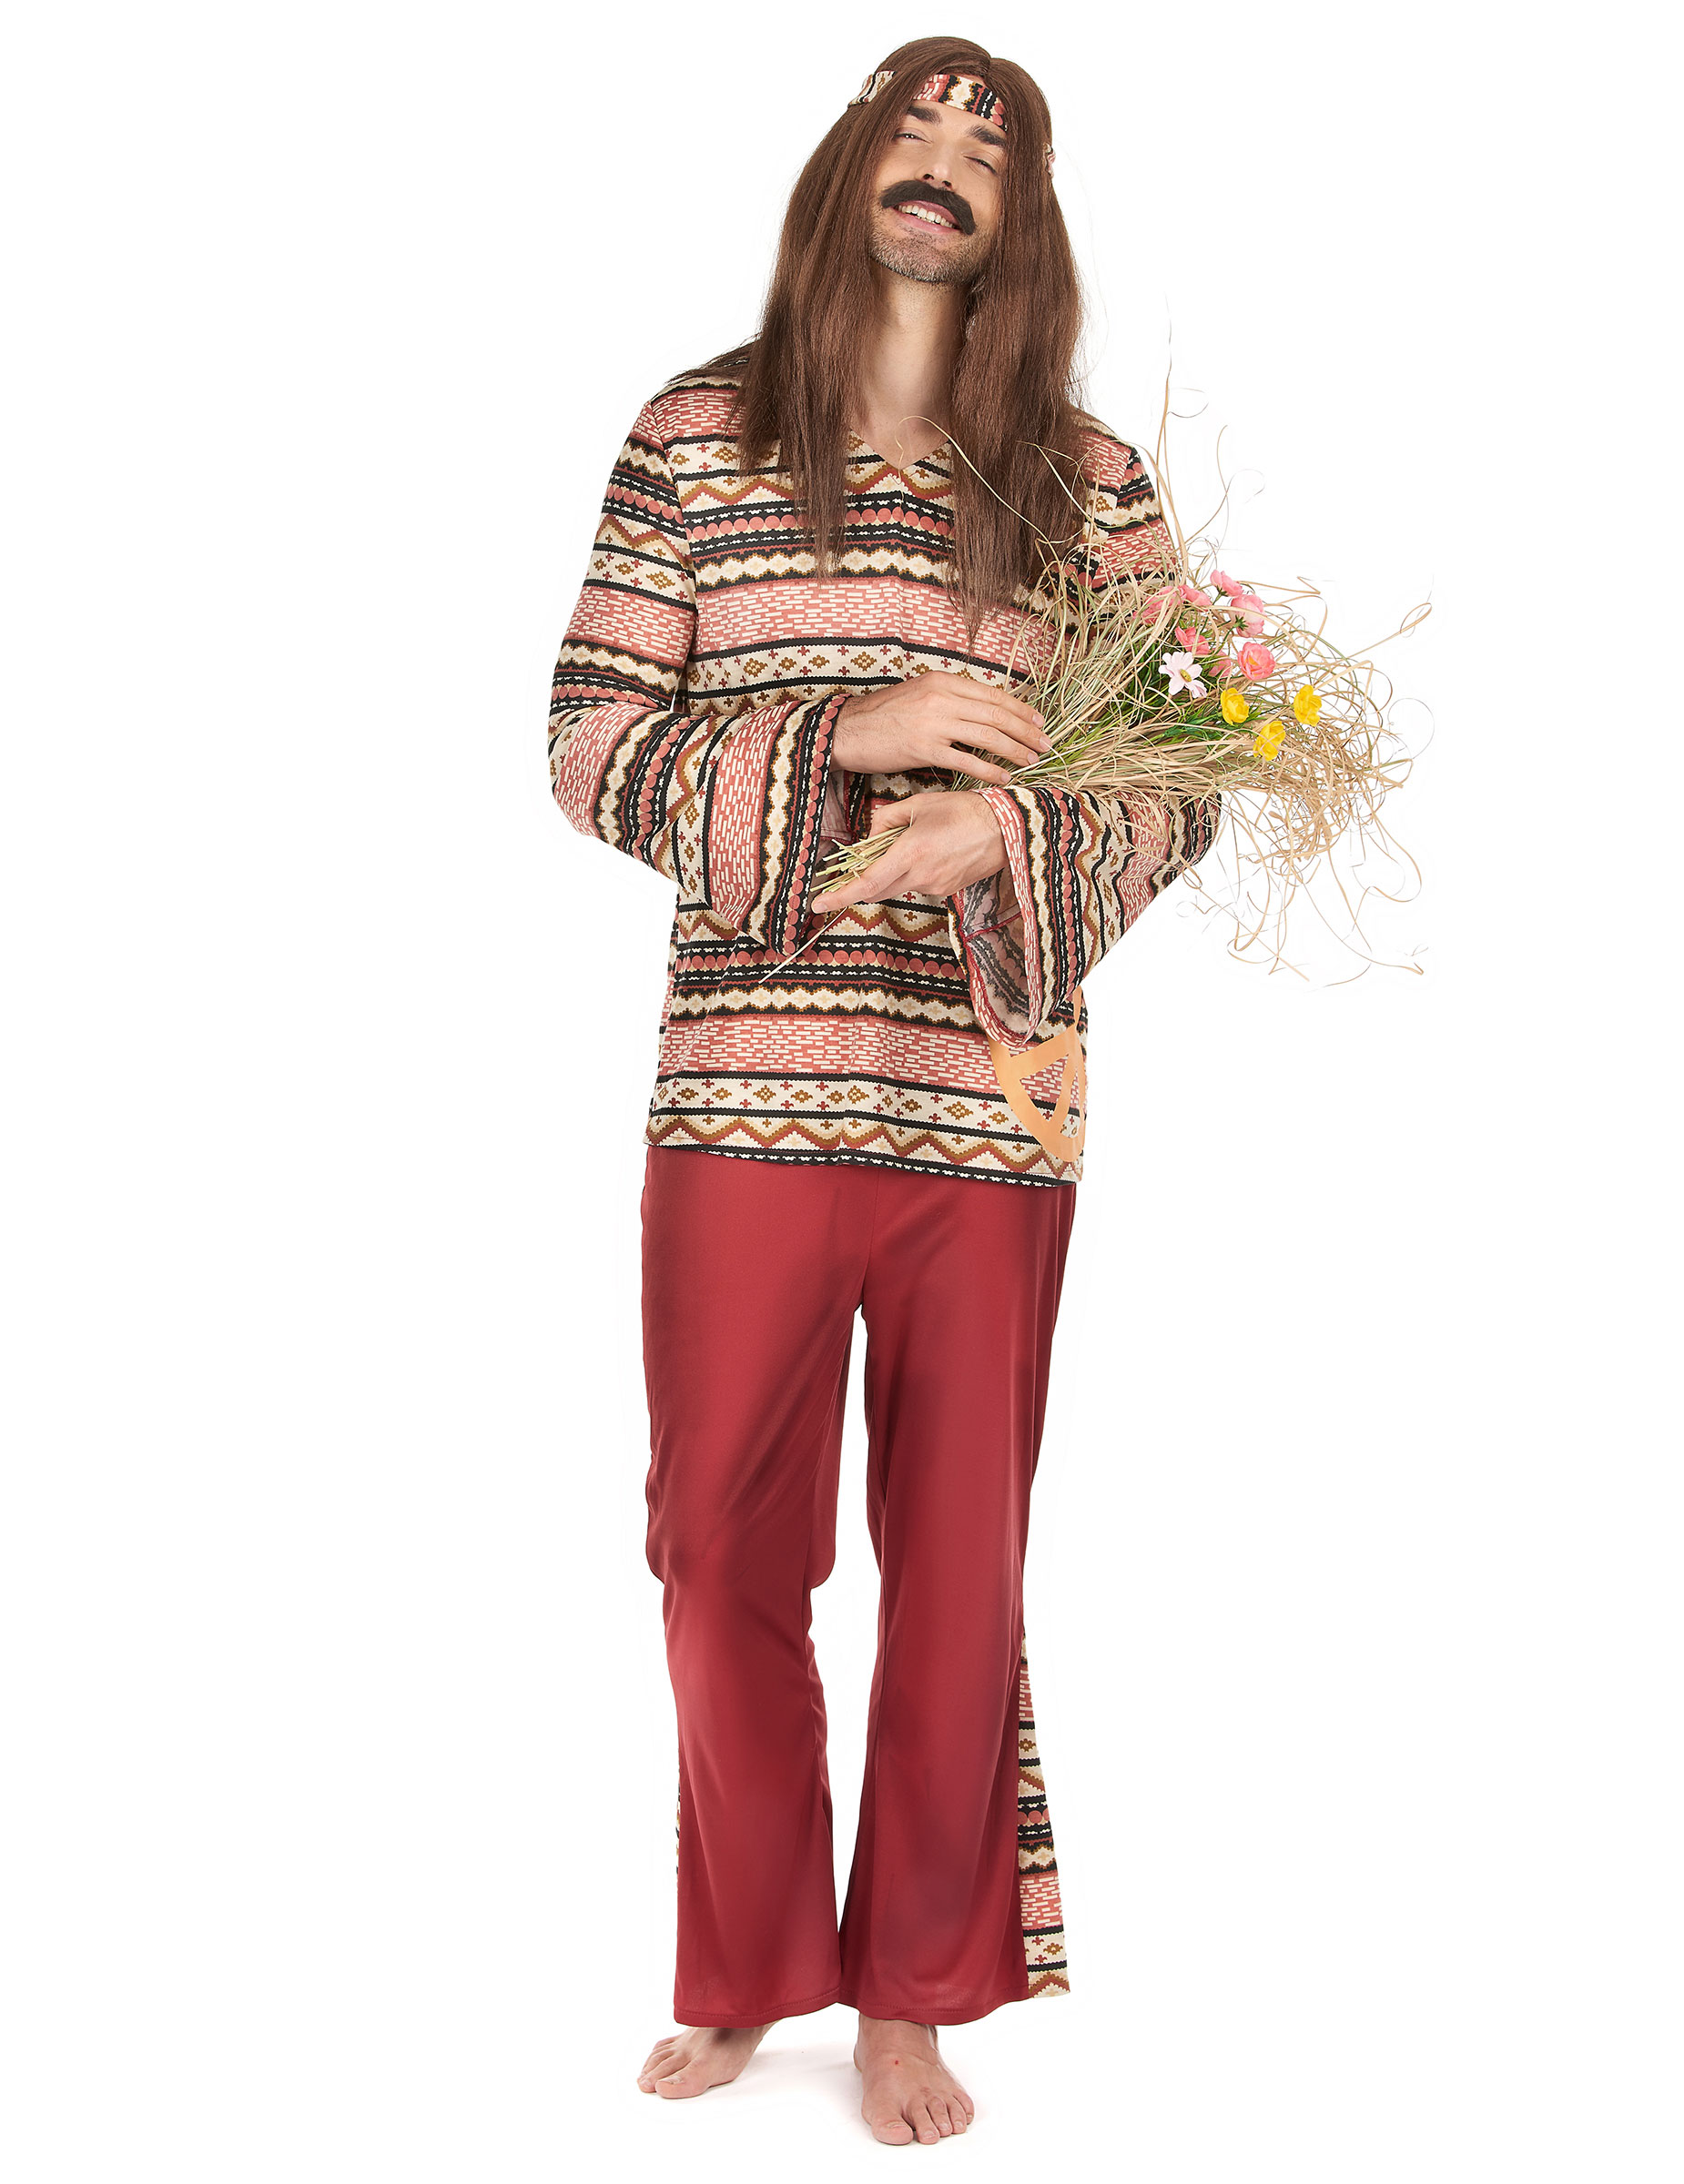 chemise homme hippie chic perfect coton homme brod caftan chemise dcontracte haut bobo chic. Black Bedroom Furniture Sets. Home Design Ideas